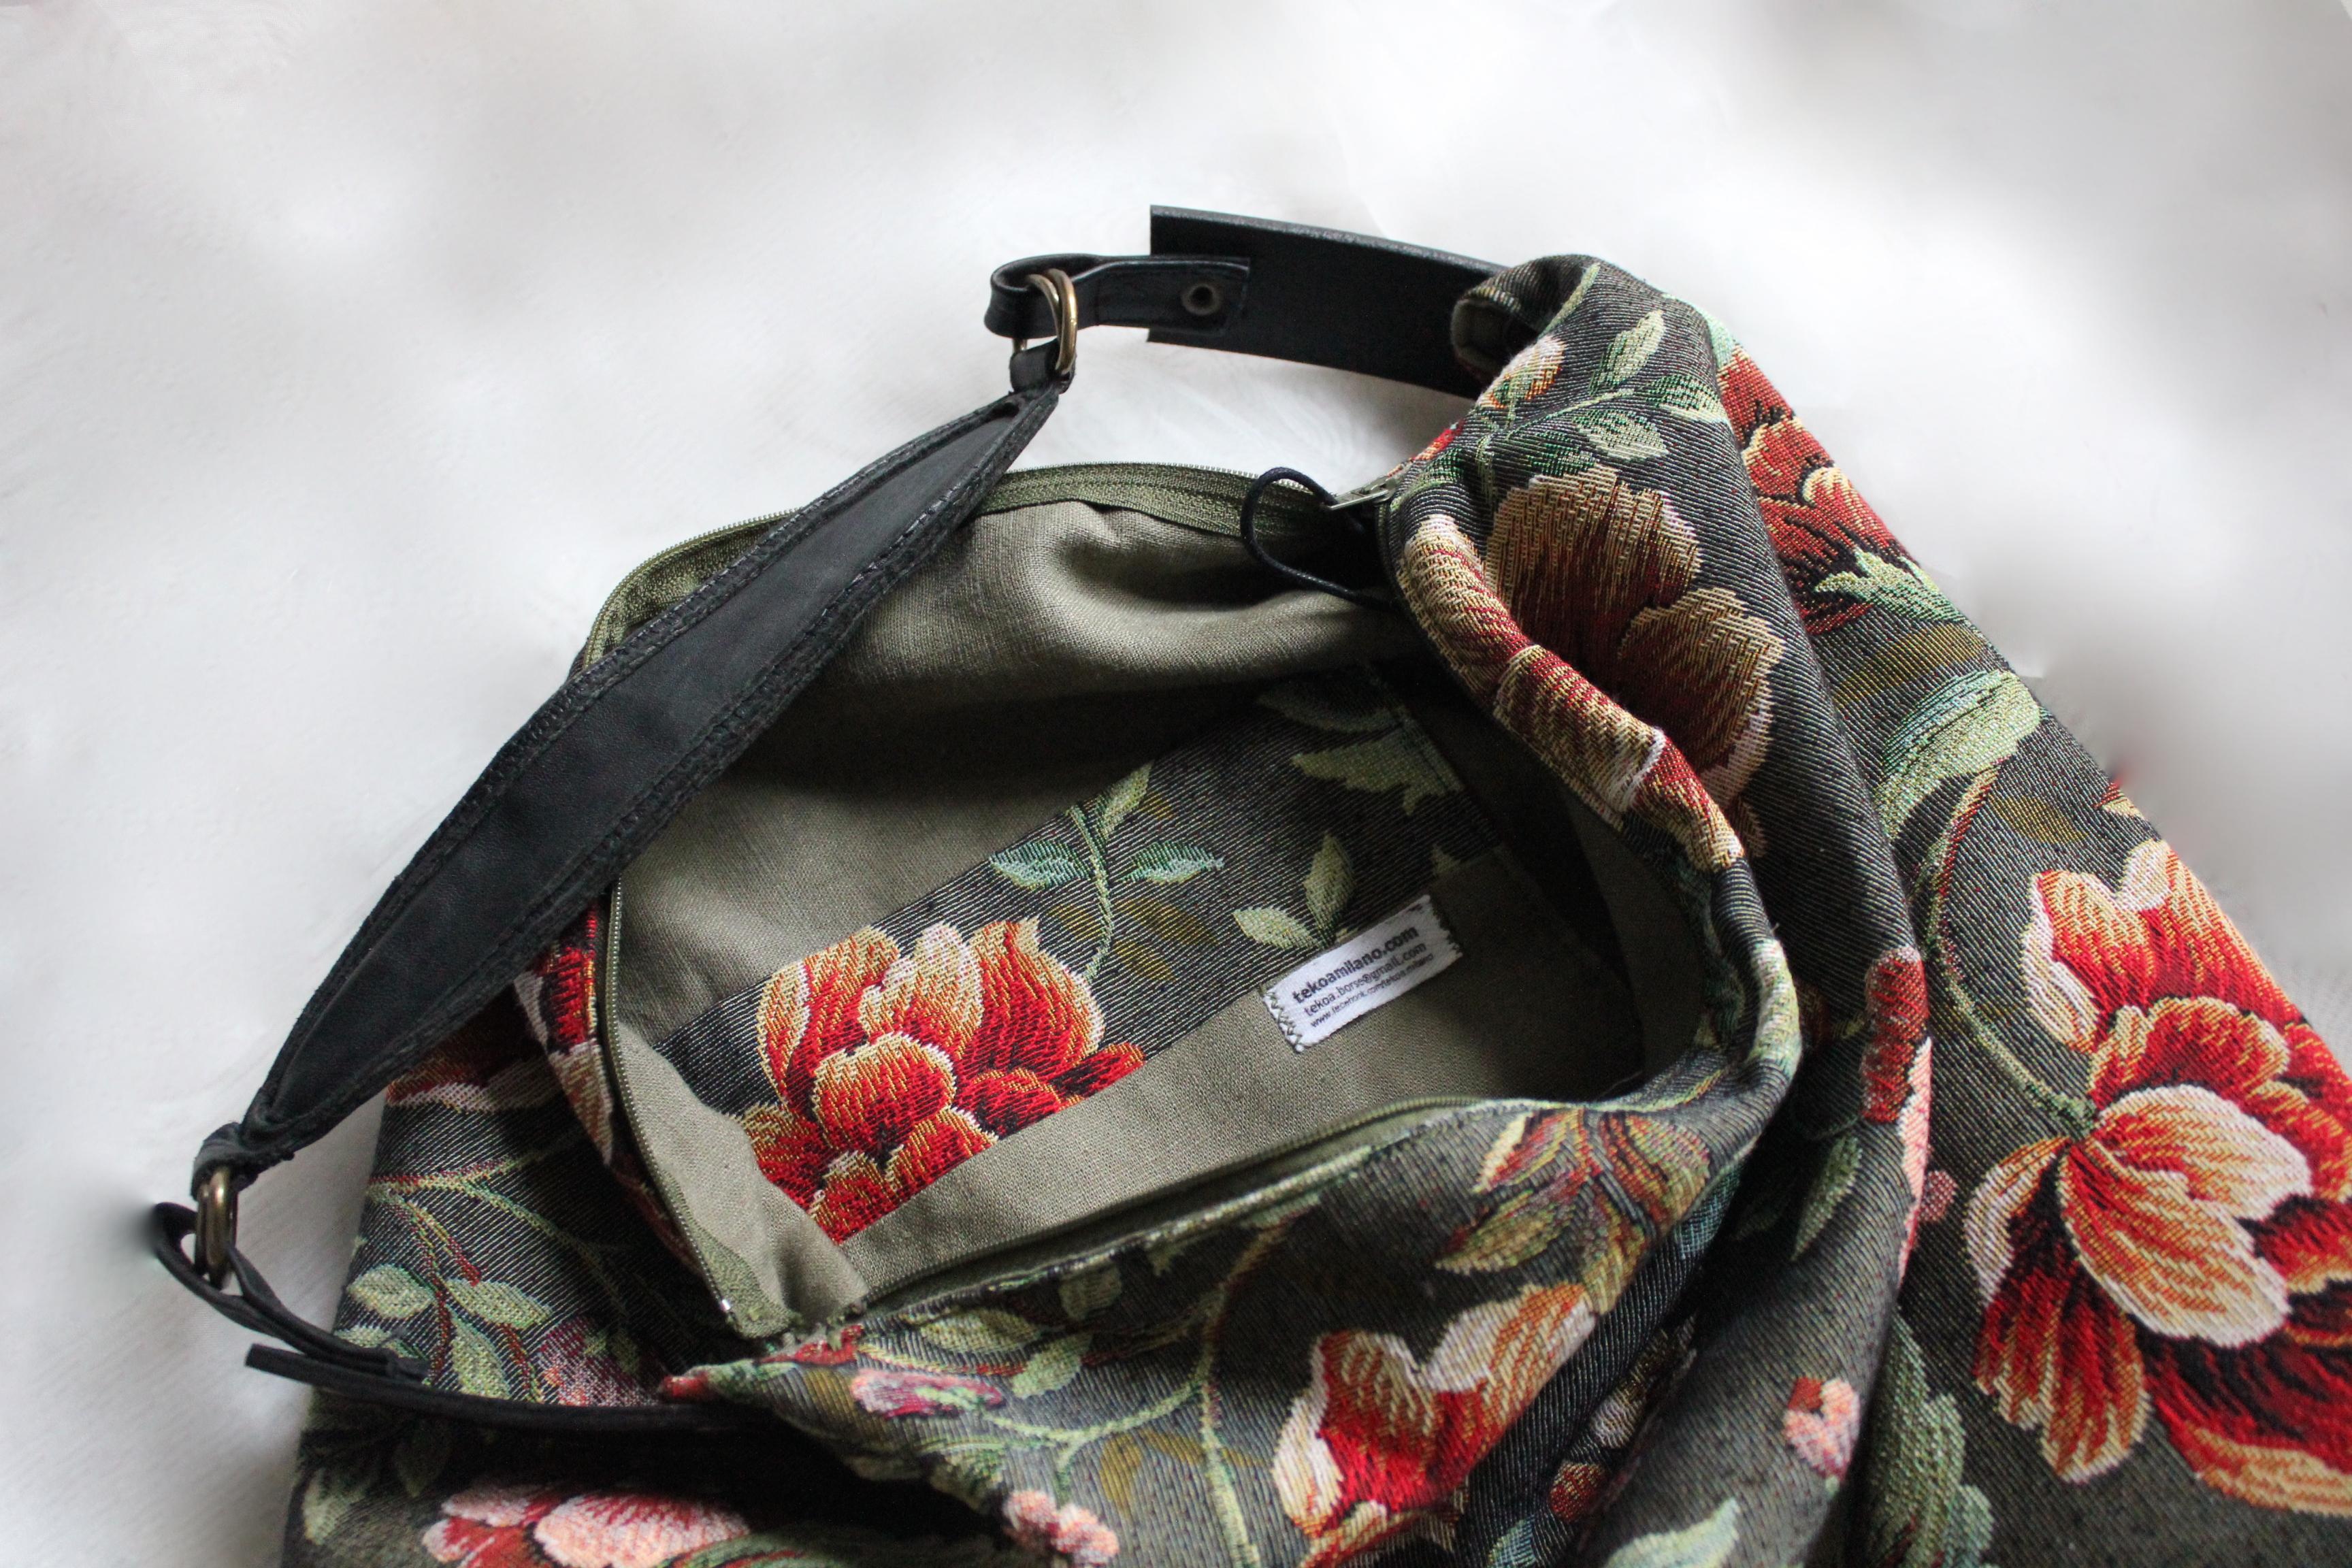 Borse Artigianali Tessuto : Roseto borsa di tessuto fatta a mano tekoa milano